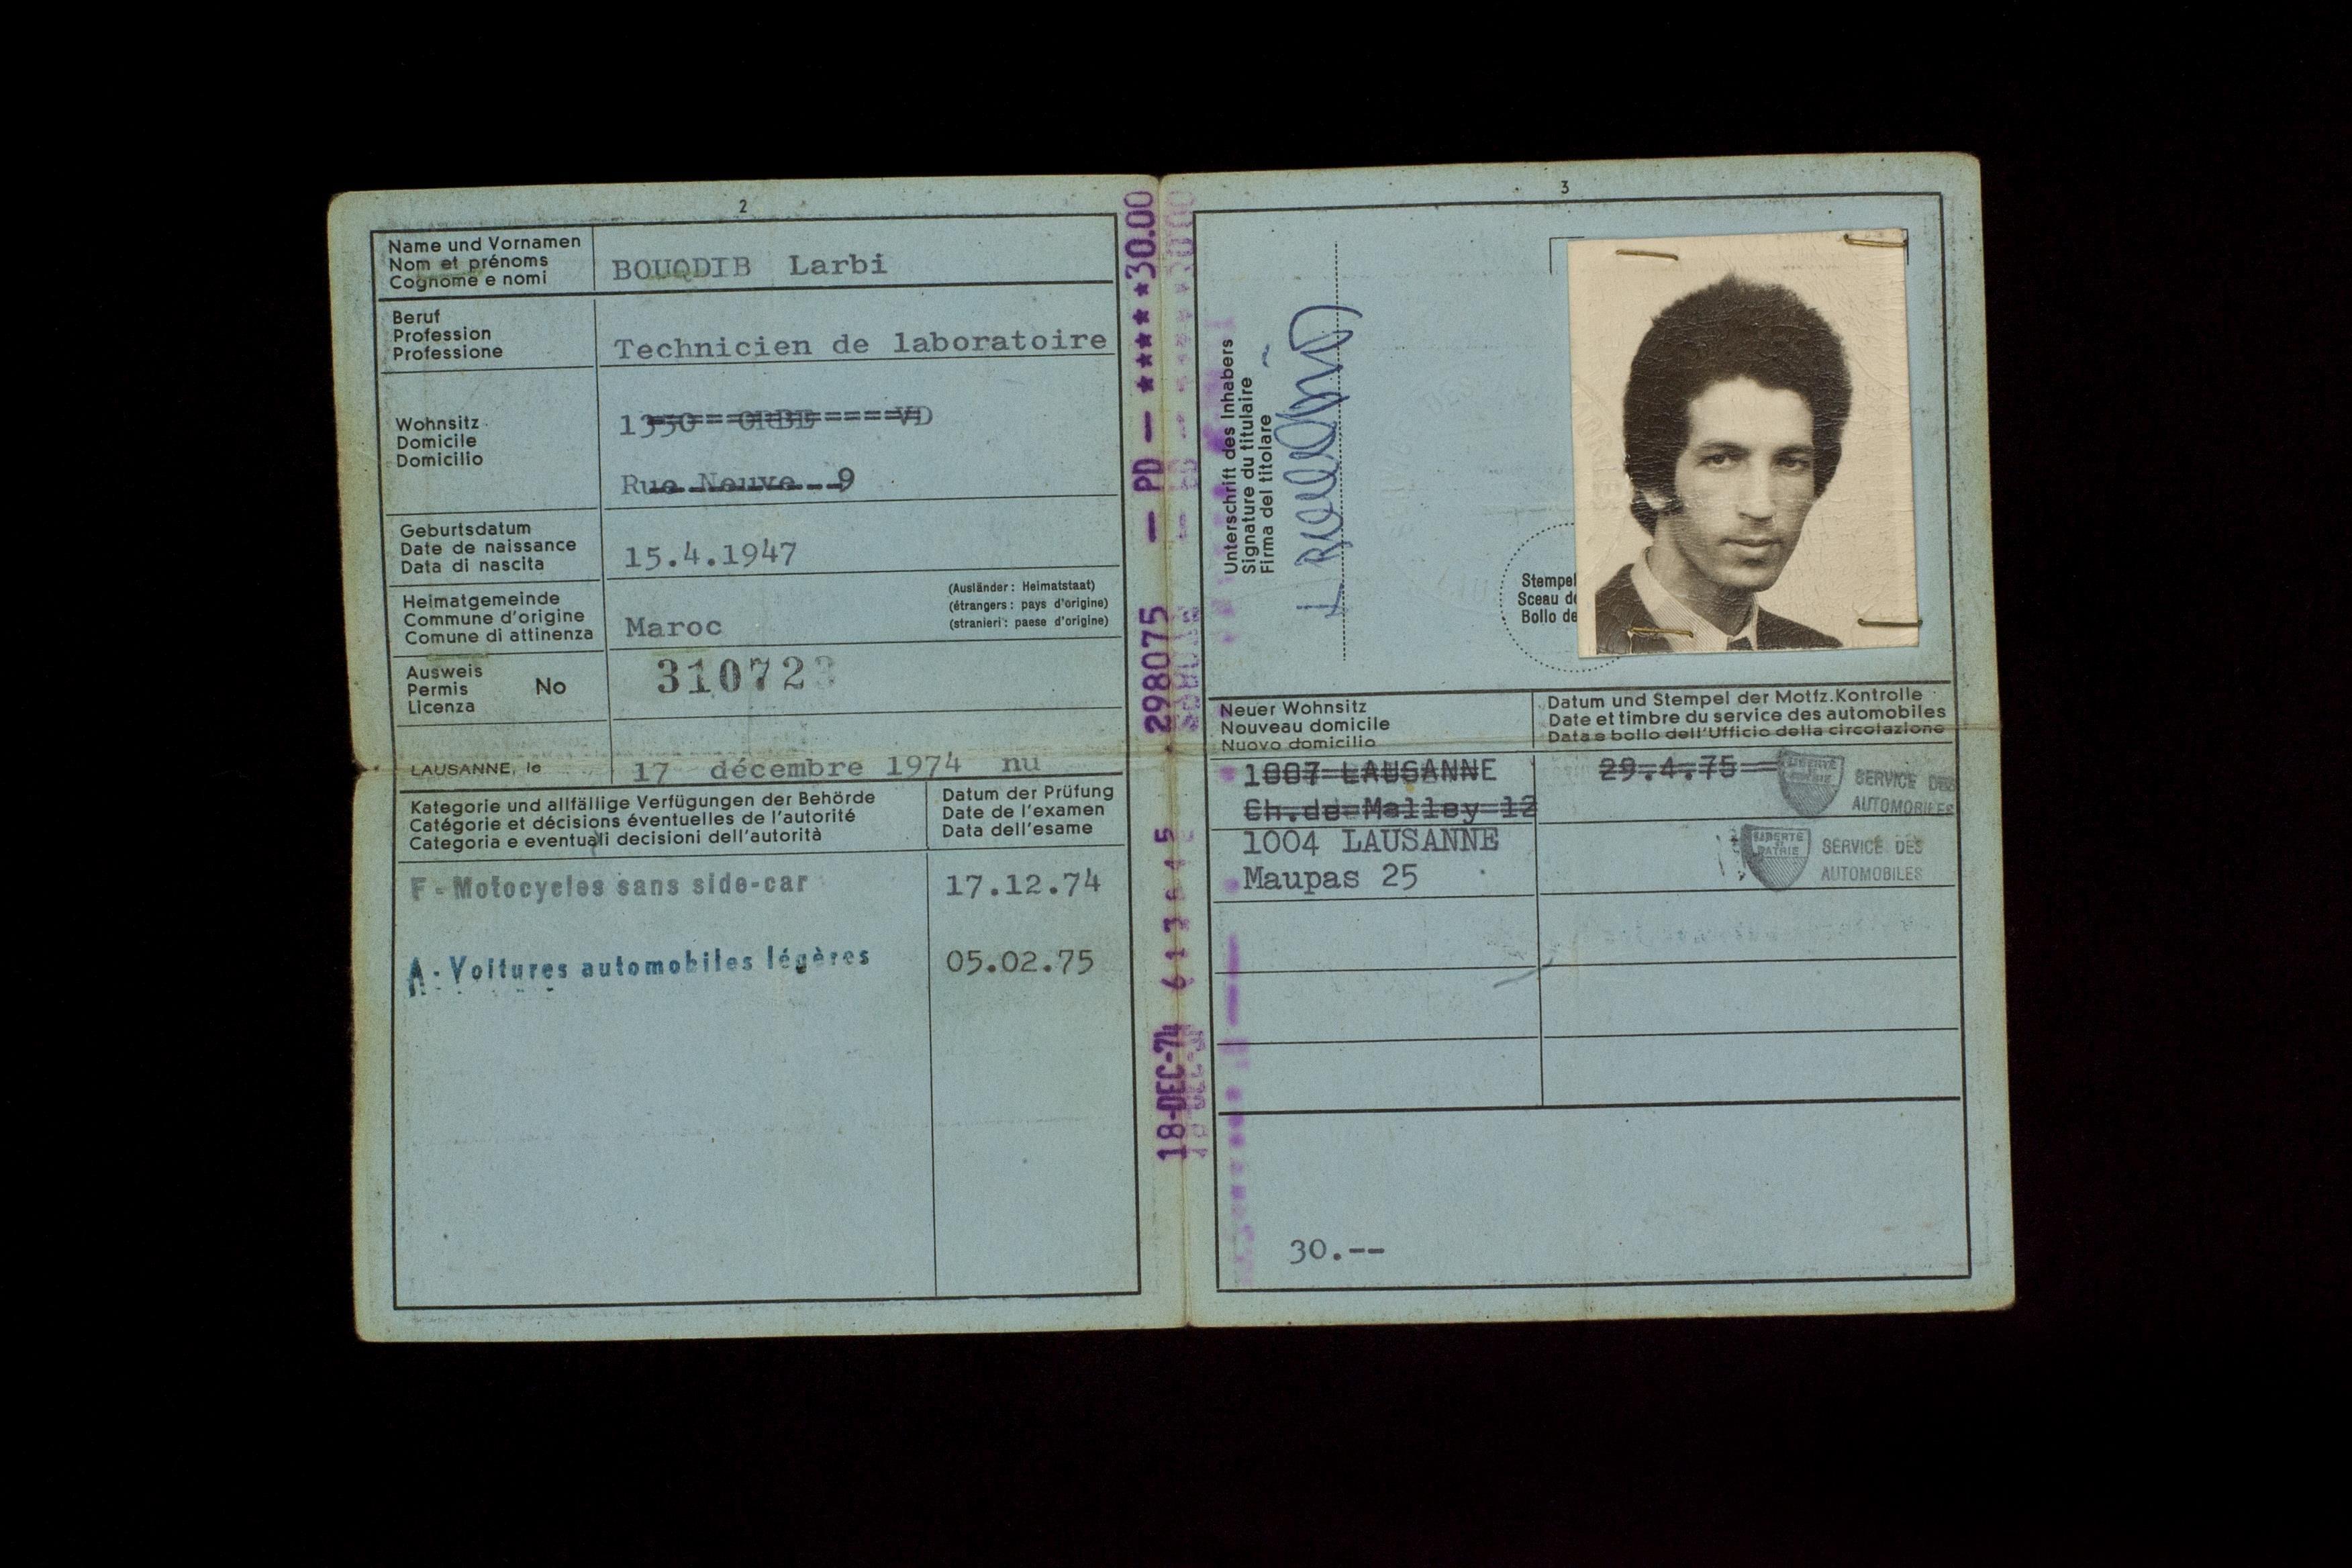 1-6 | Führerausweis # 310723 | Permis de conduire # 310723 (17. Dezember 1974)